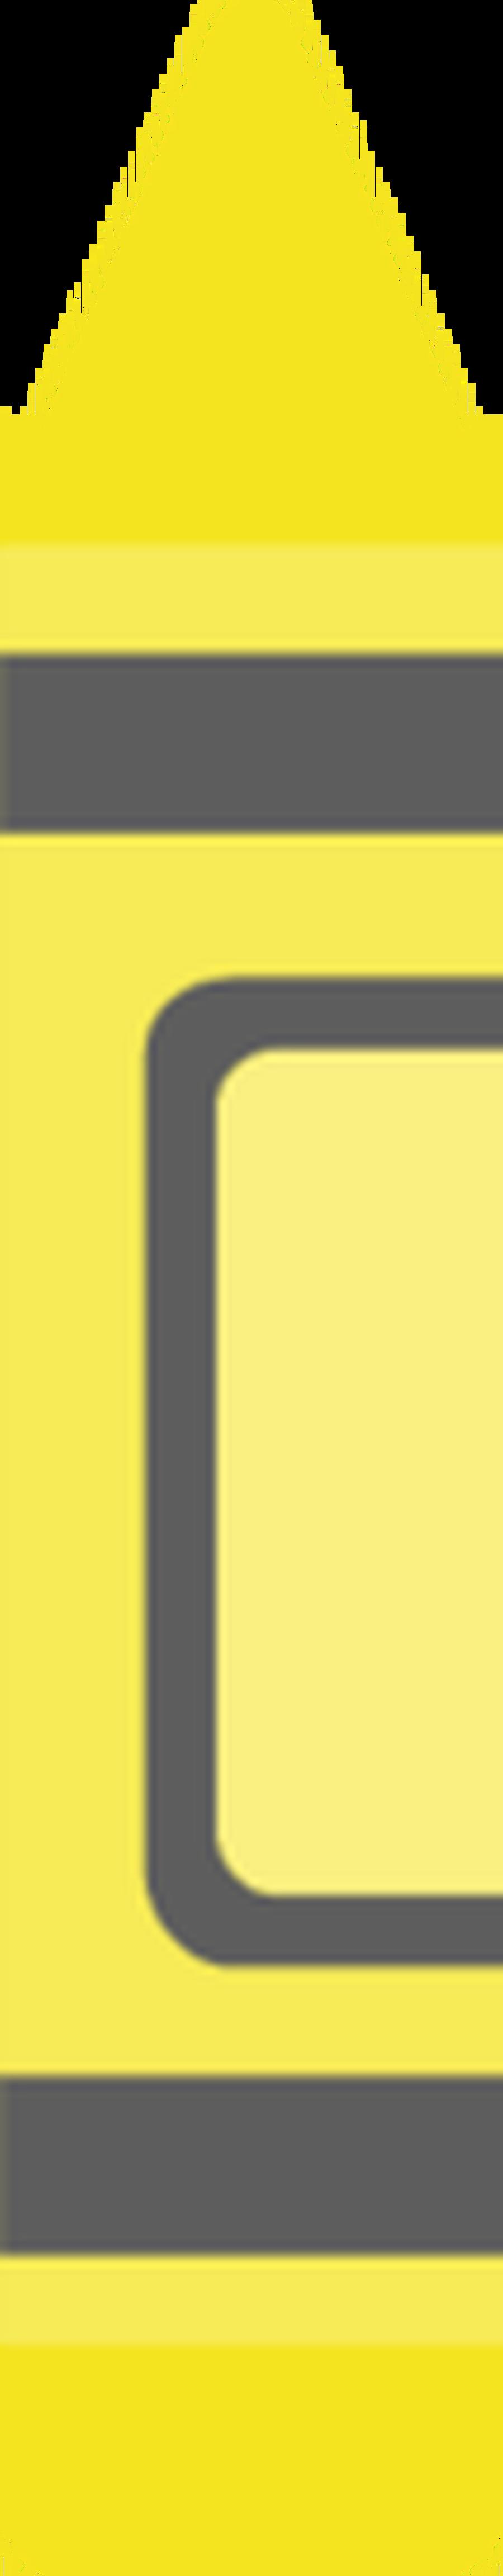 Crayon clipart yellow crayon Clipart Yellow Free Clipart ~